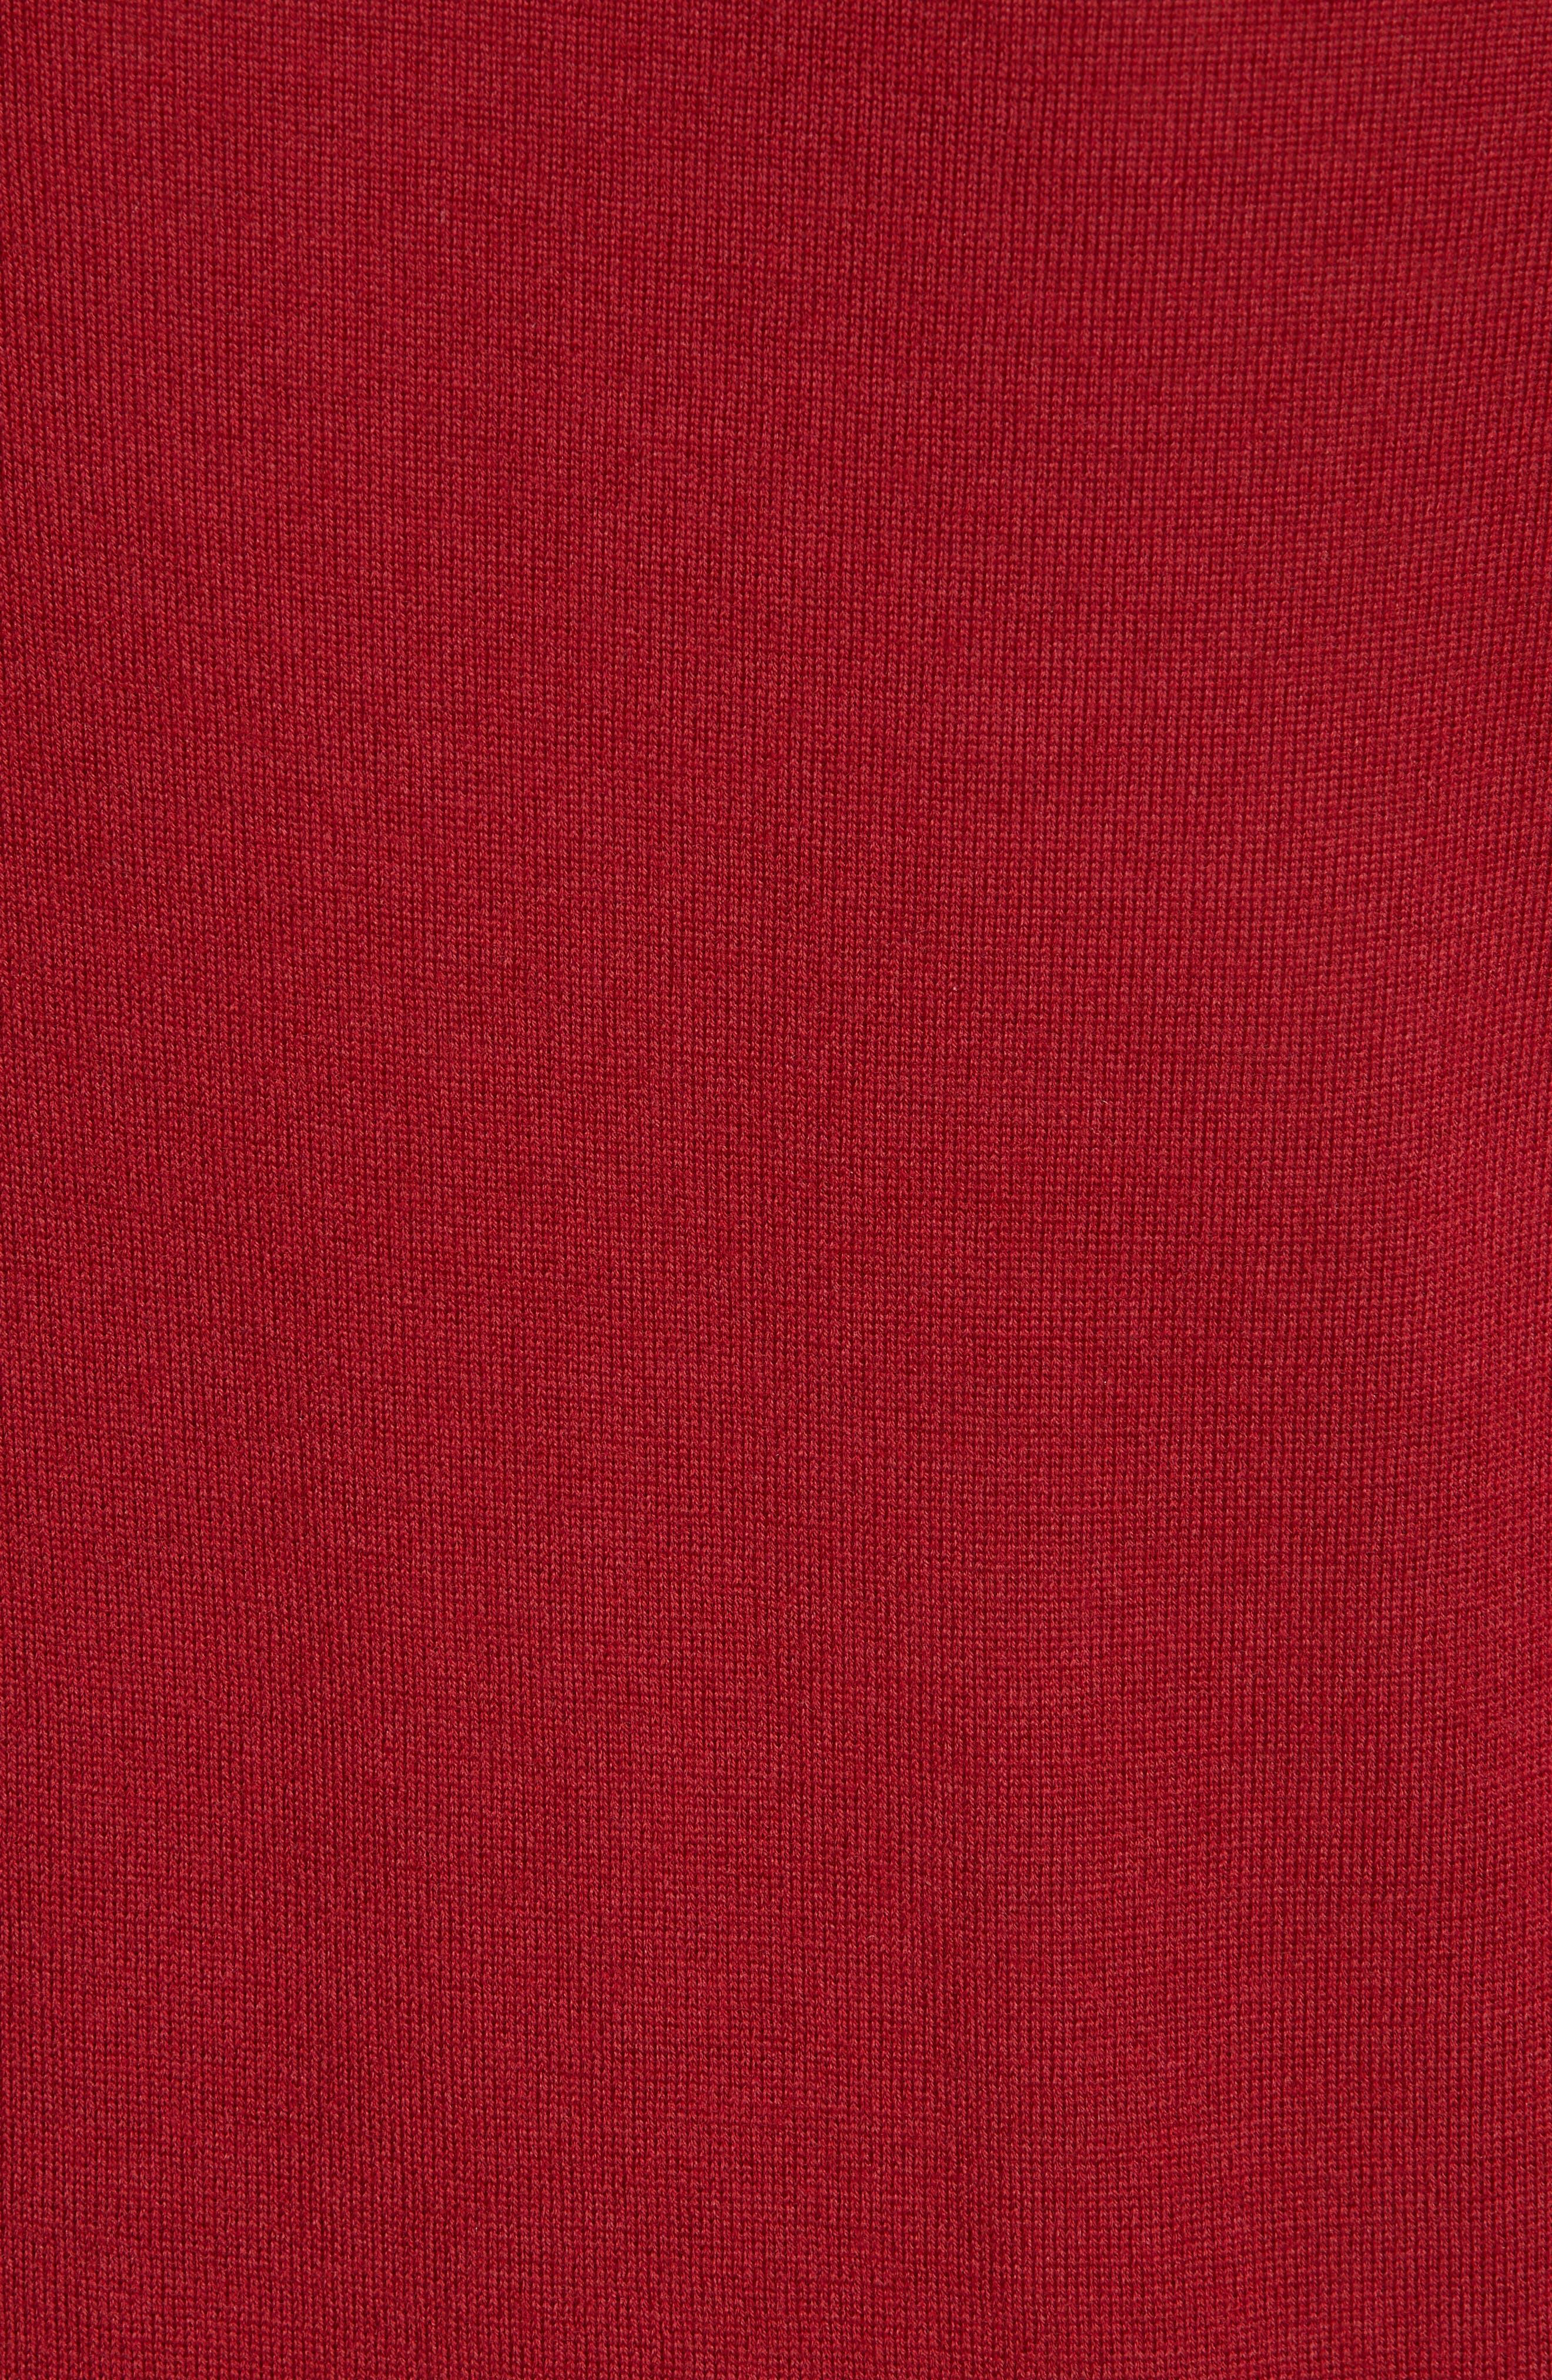 Frankie Cuff Detail Wool Sweater,                             Alternate thumbnail 5, color,                             DARK RED